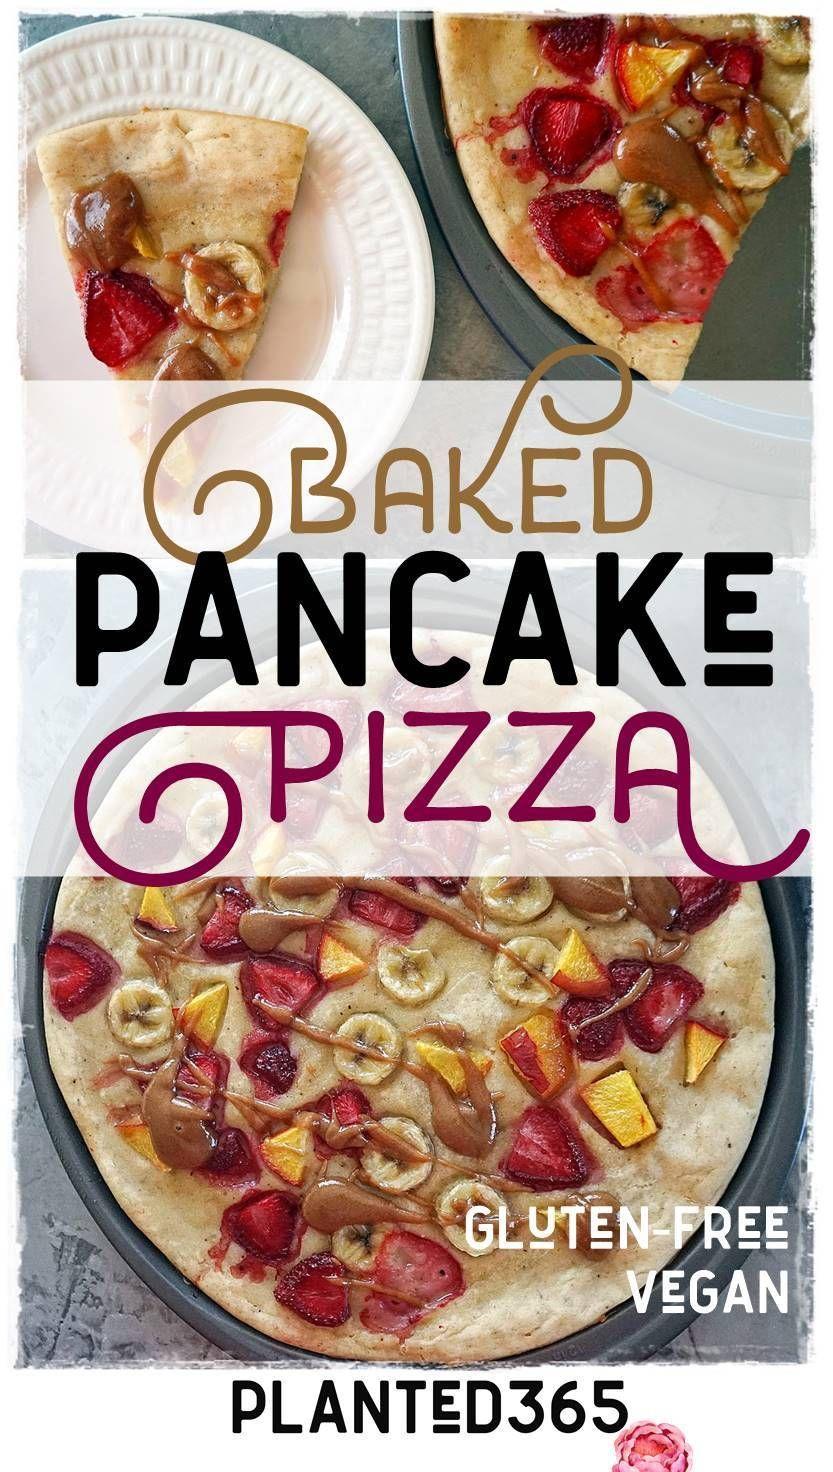 Baked Pancake Pizza Vegan Gluten Free From Planted365 In 2020 Recipes Vegan Recipes Easy Vegan Recipes